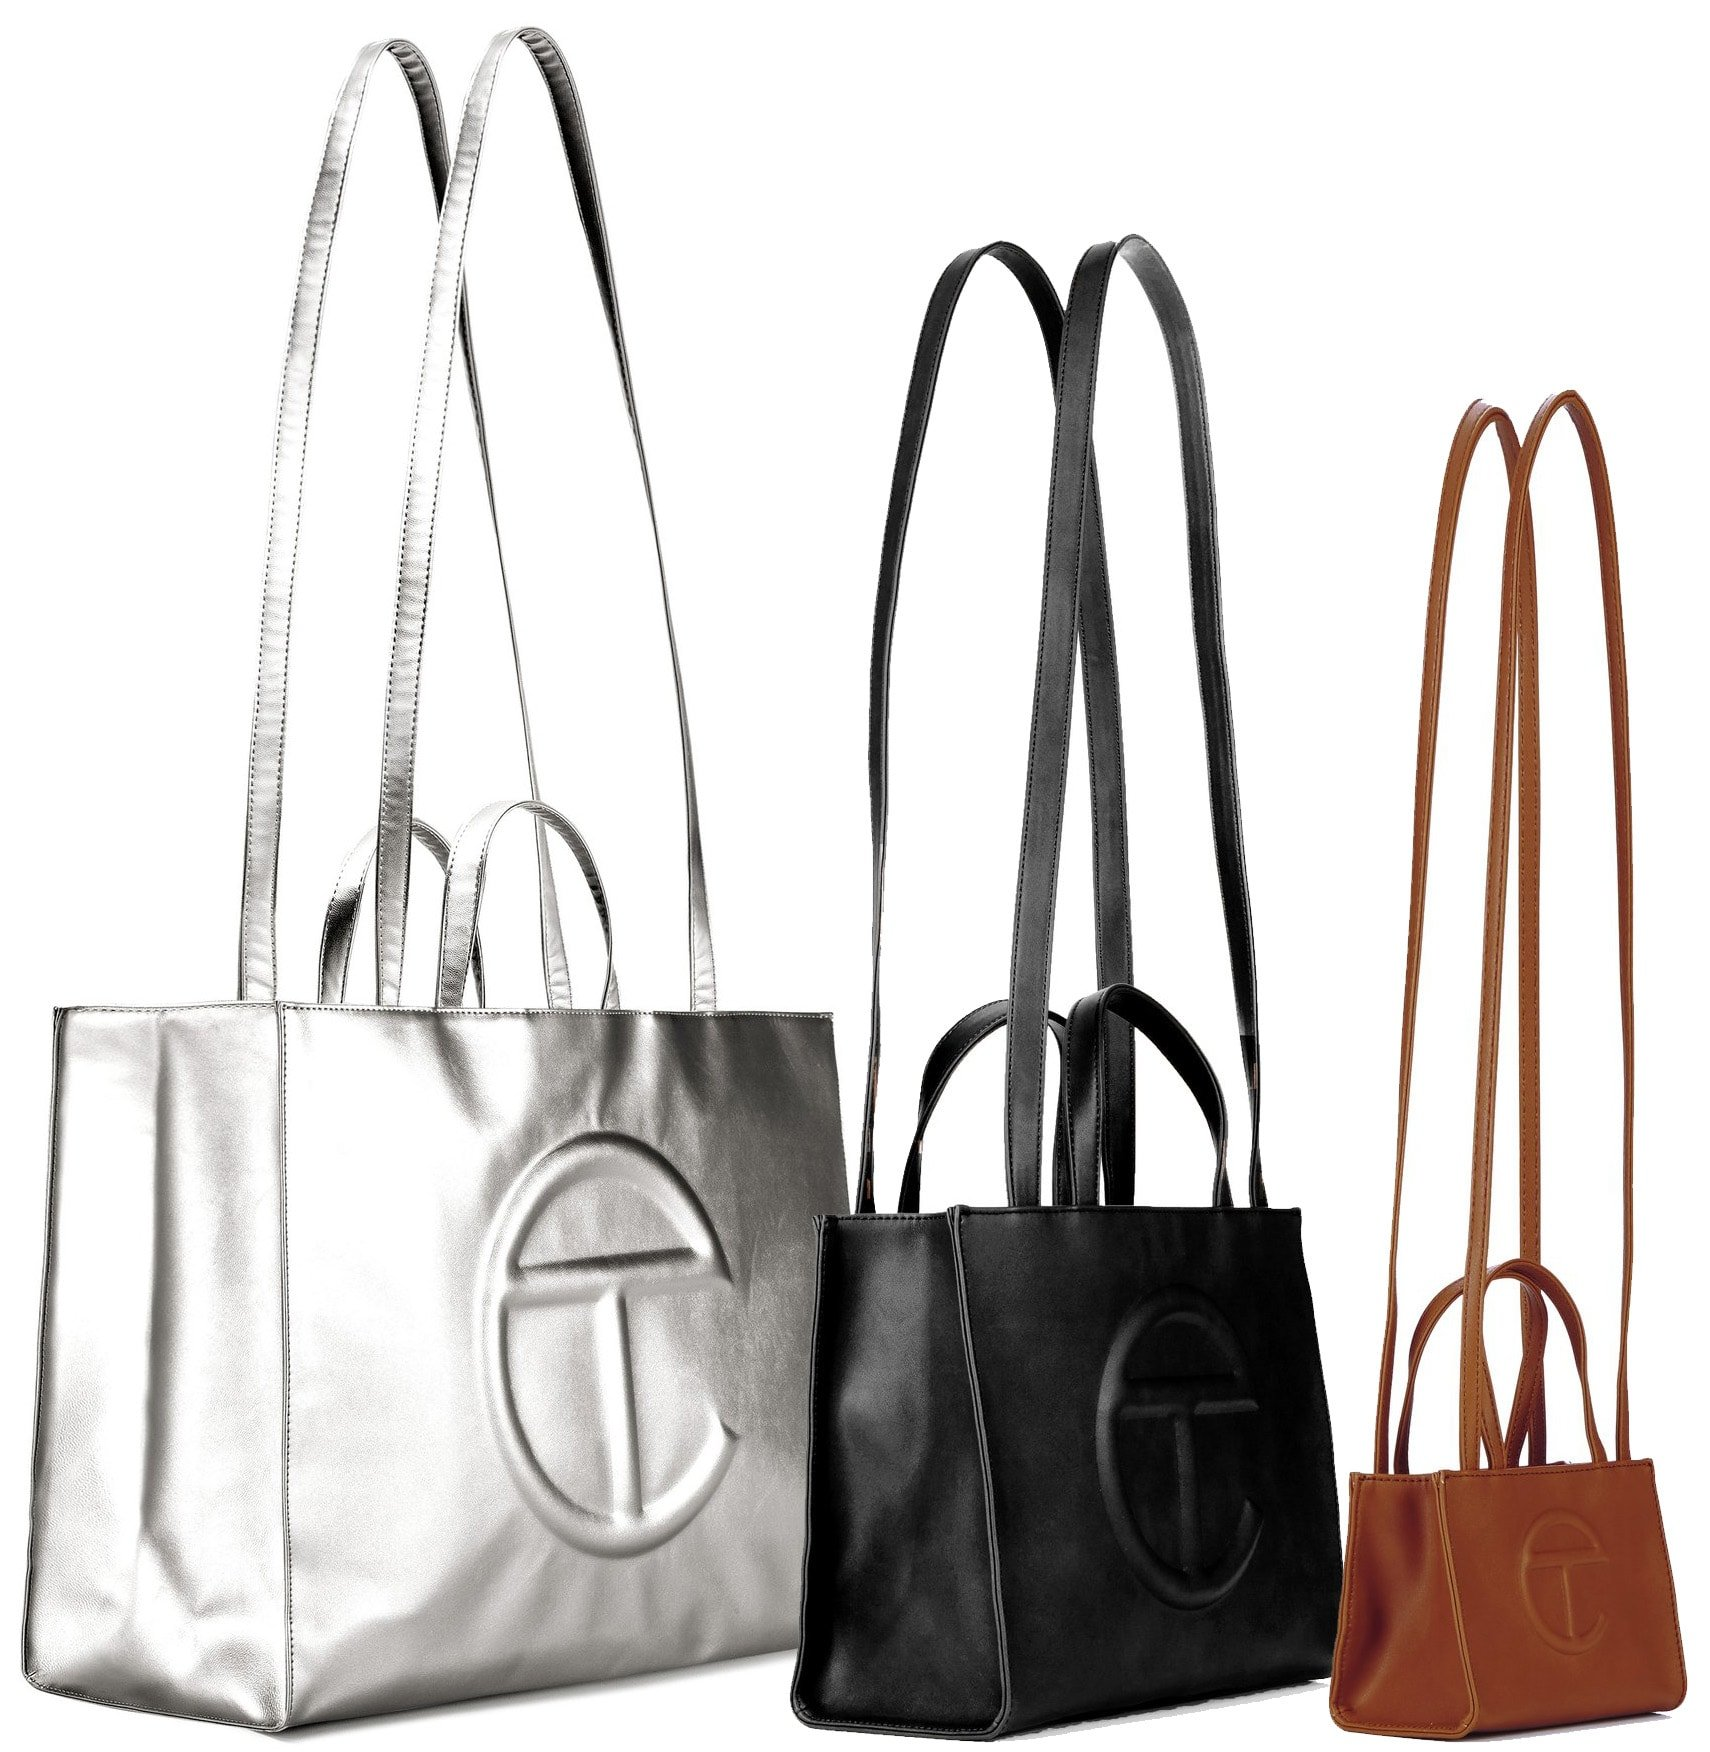 Telfar's popular vegan shopping bag comes in three sizes: small, medium, and large